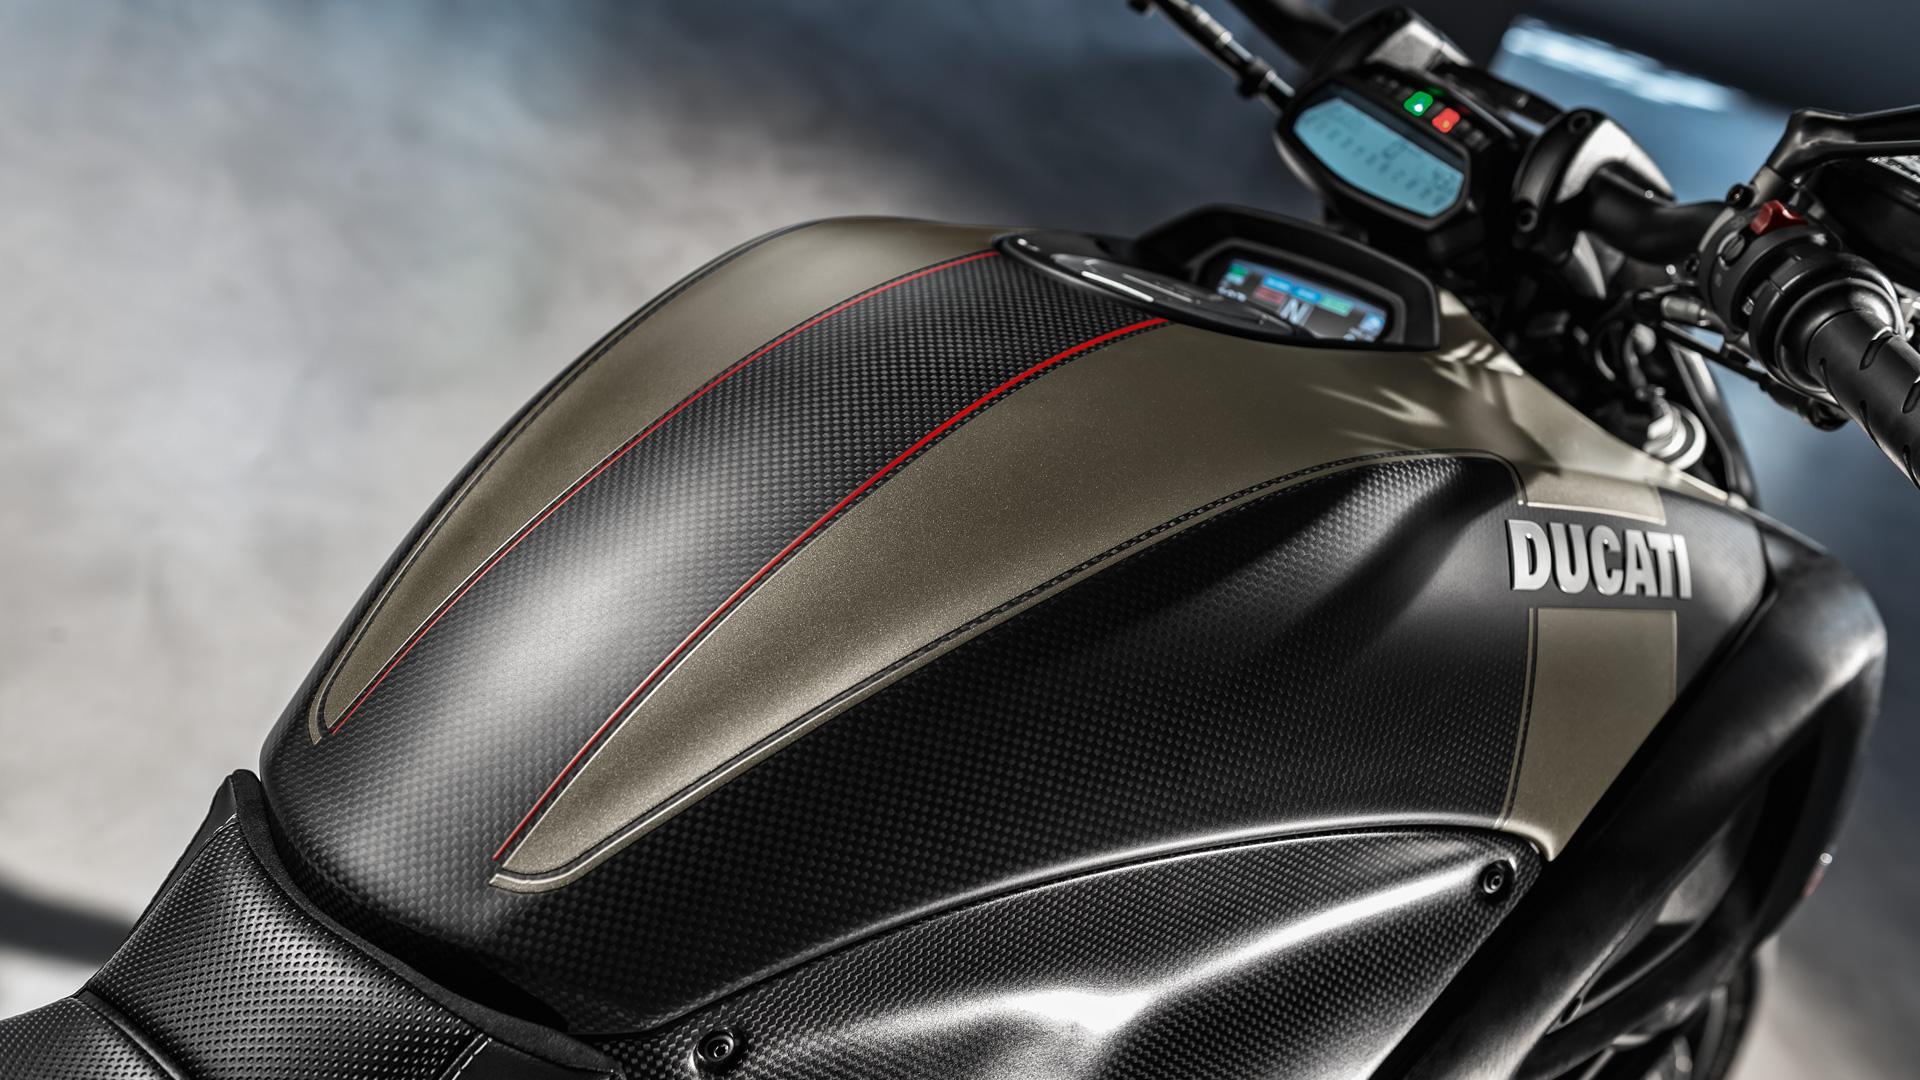 Ducati Diavel Sport Cruiser Bikes With Unique Style